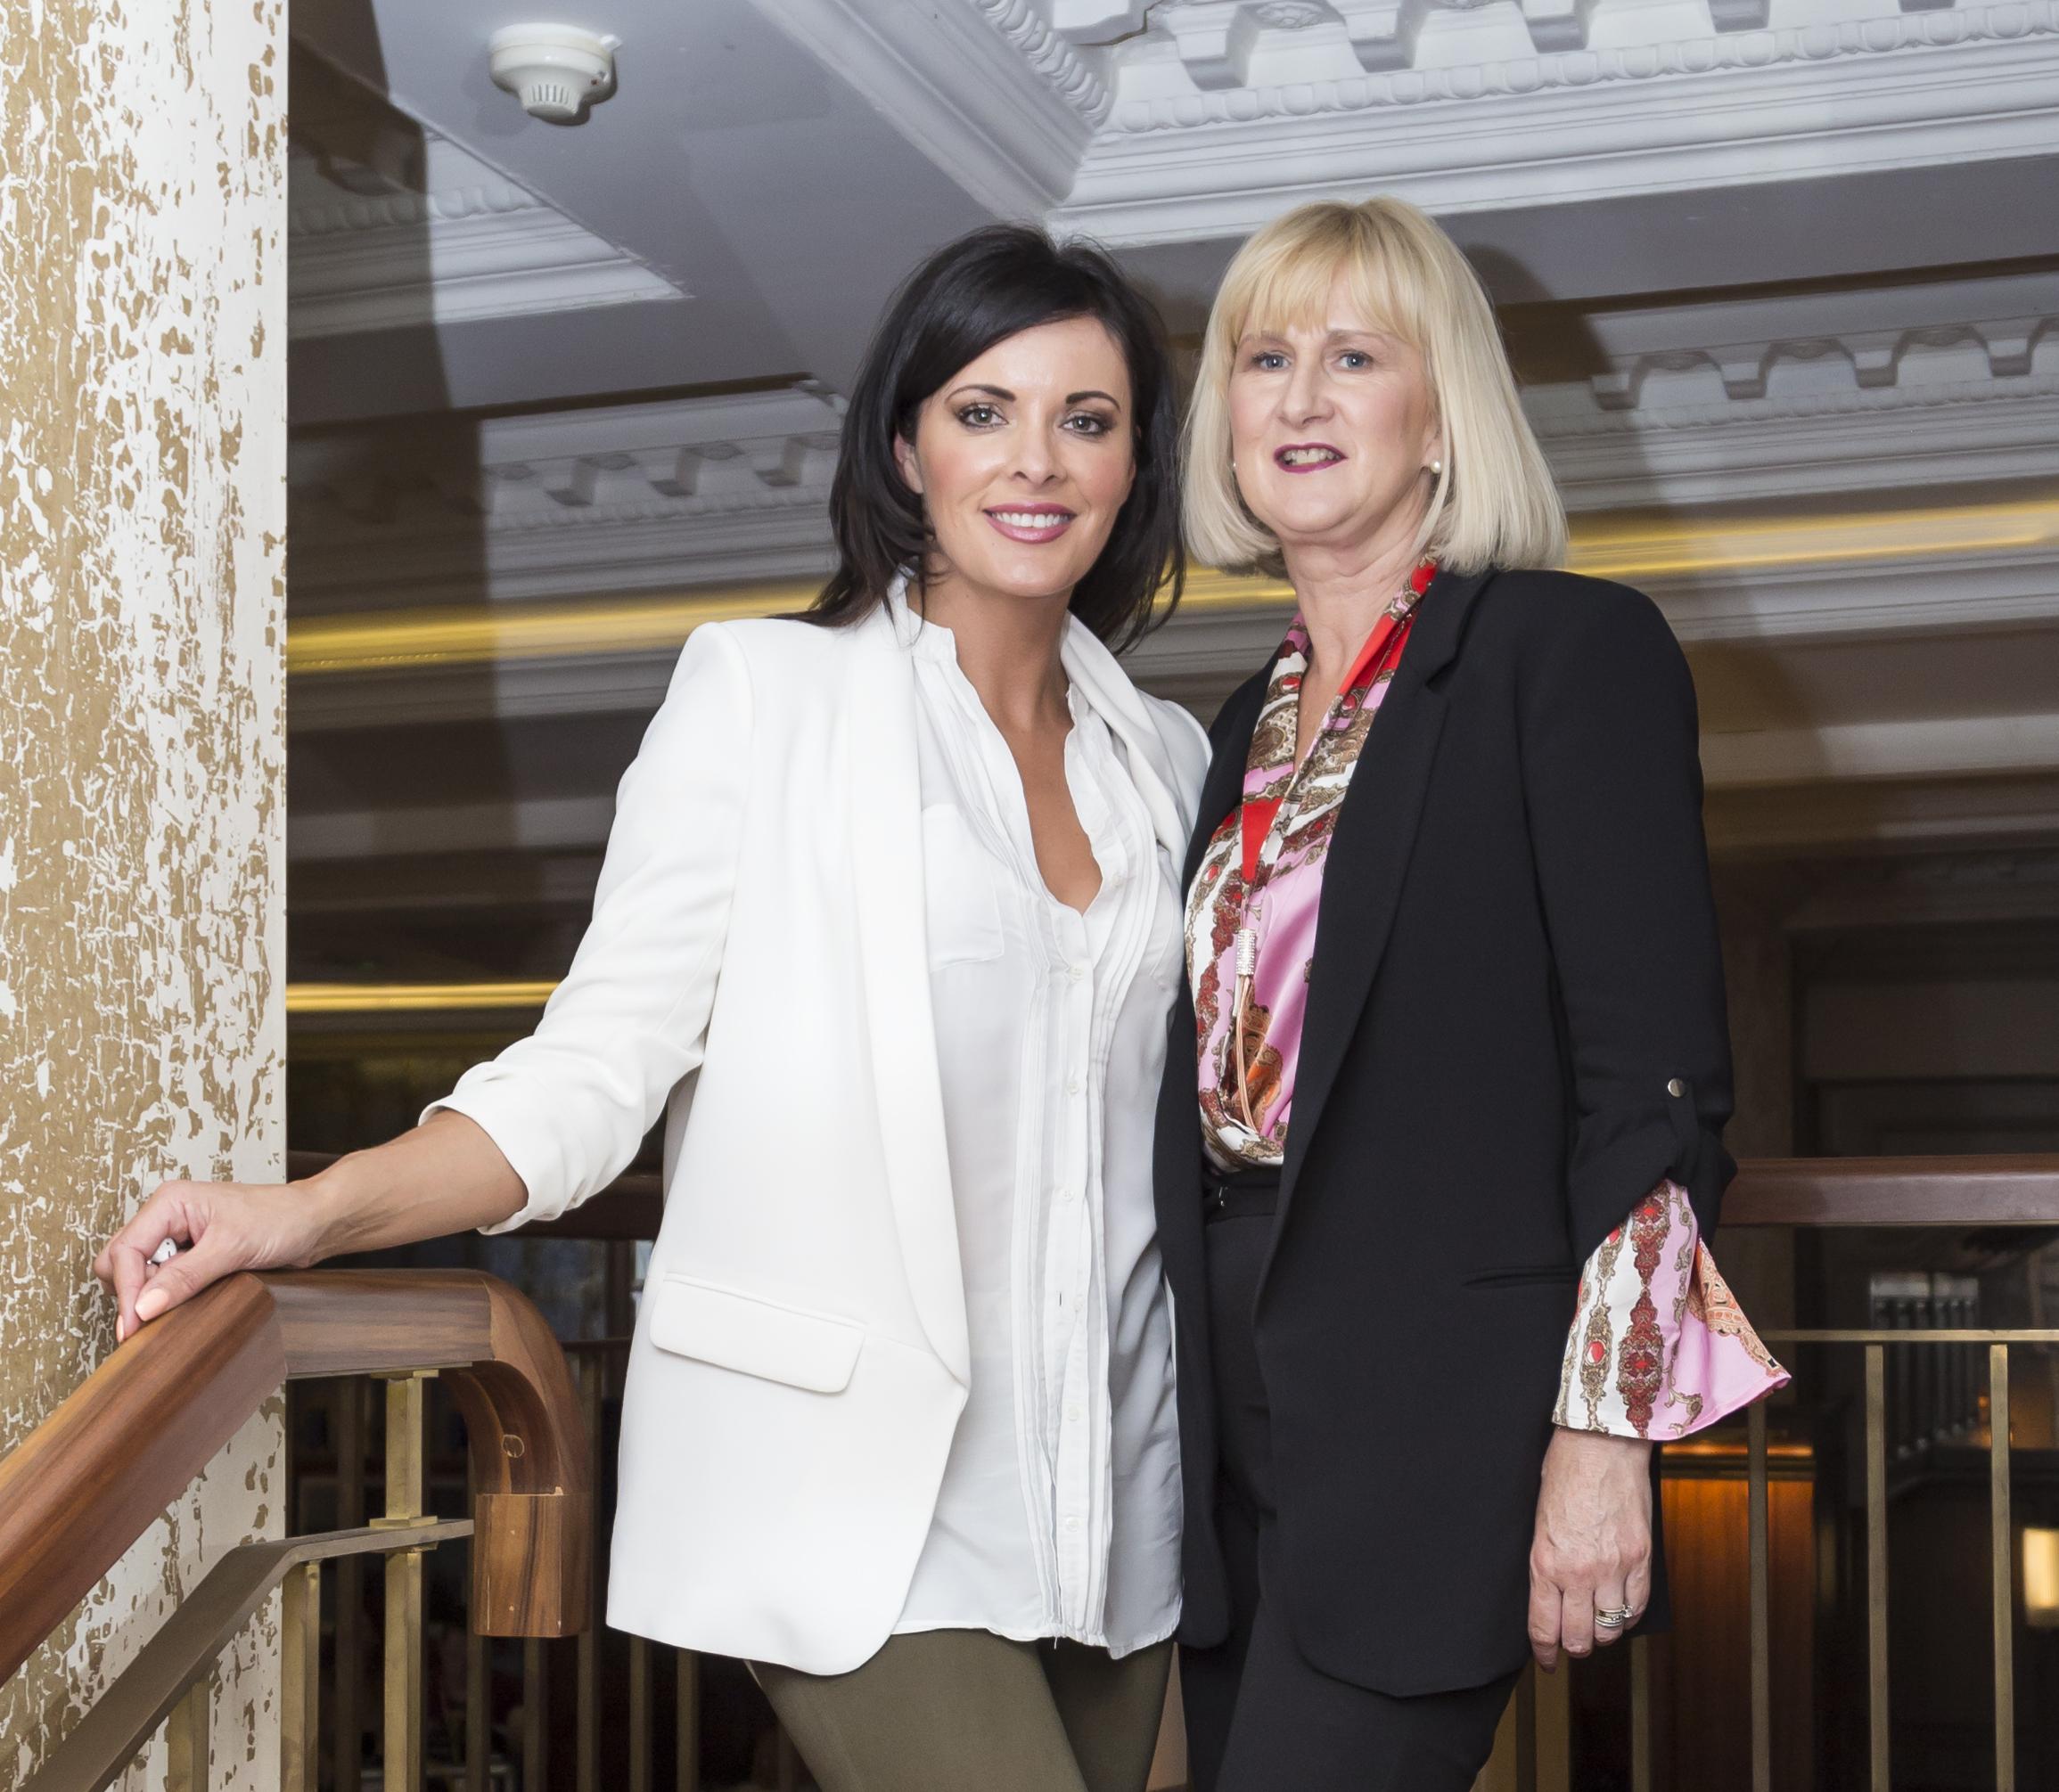 Jennifer Thomas and Lorraine O'Neill